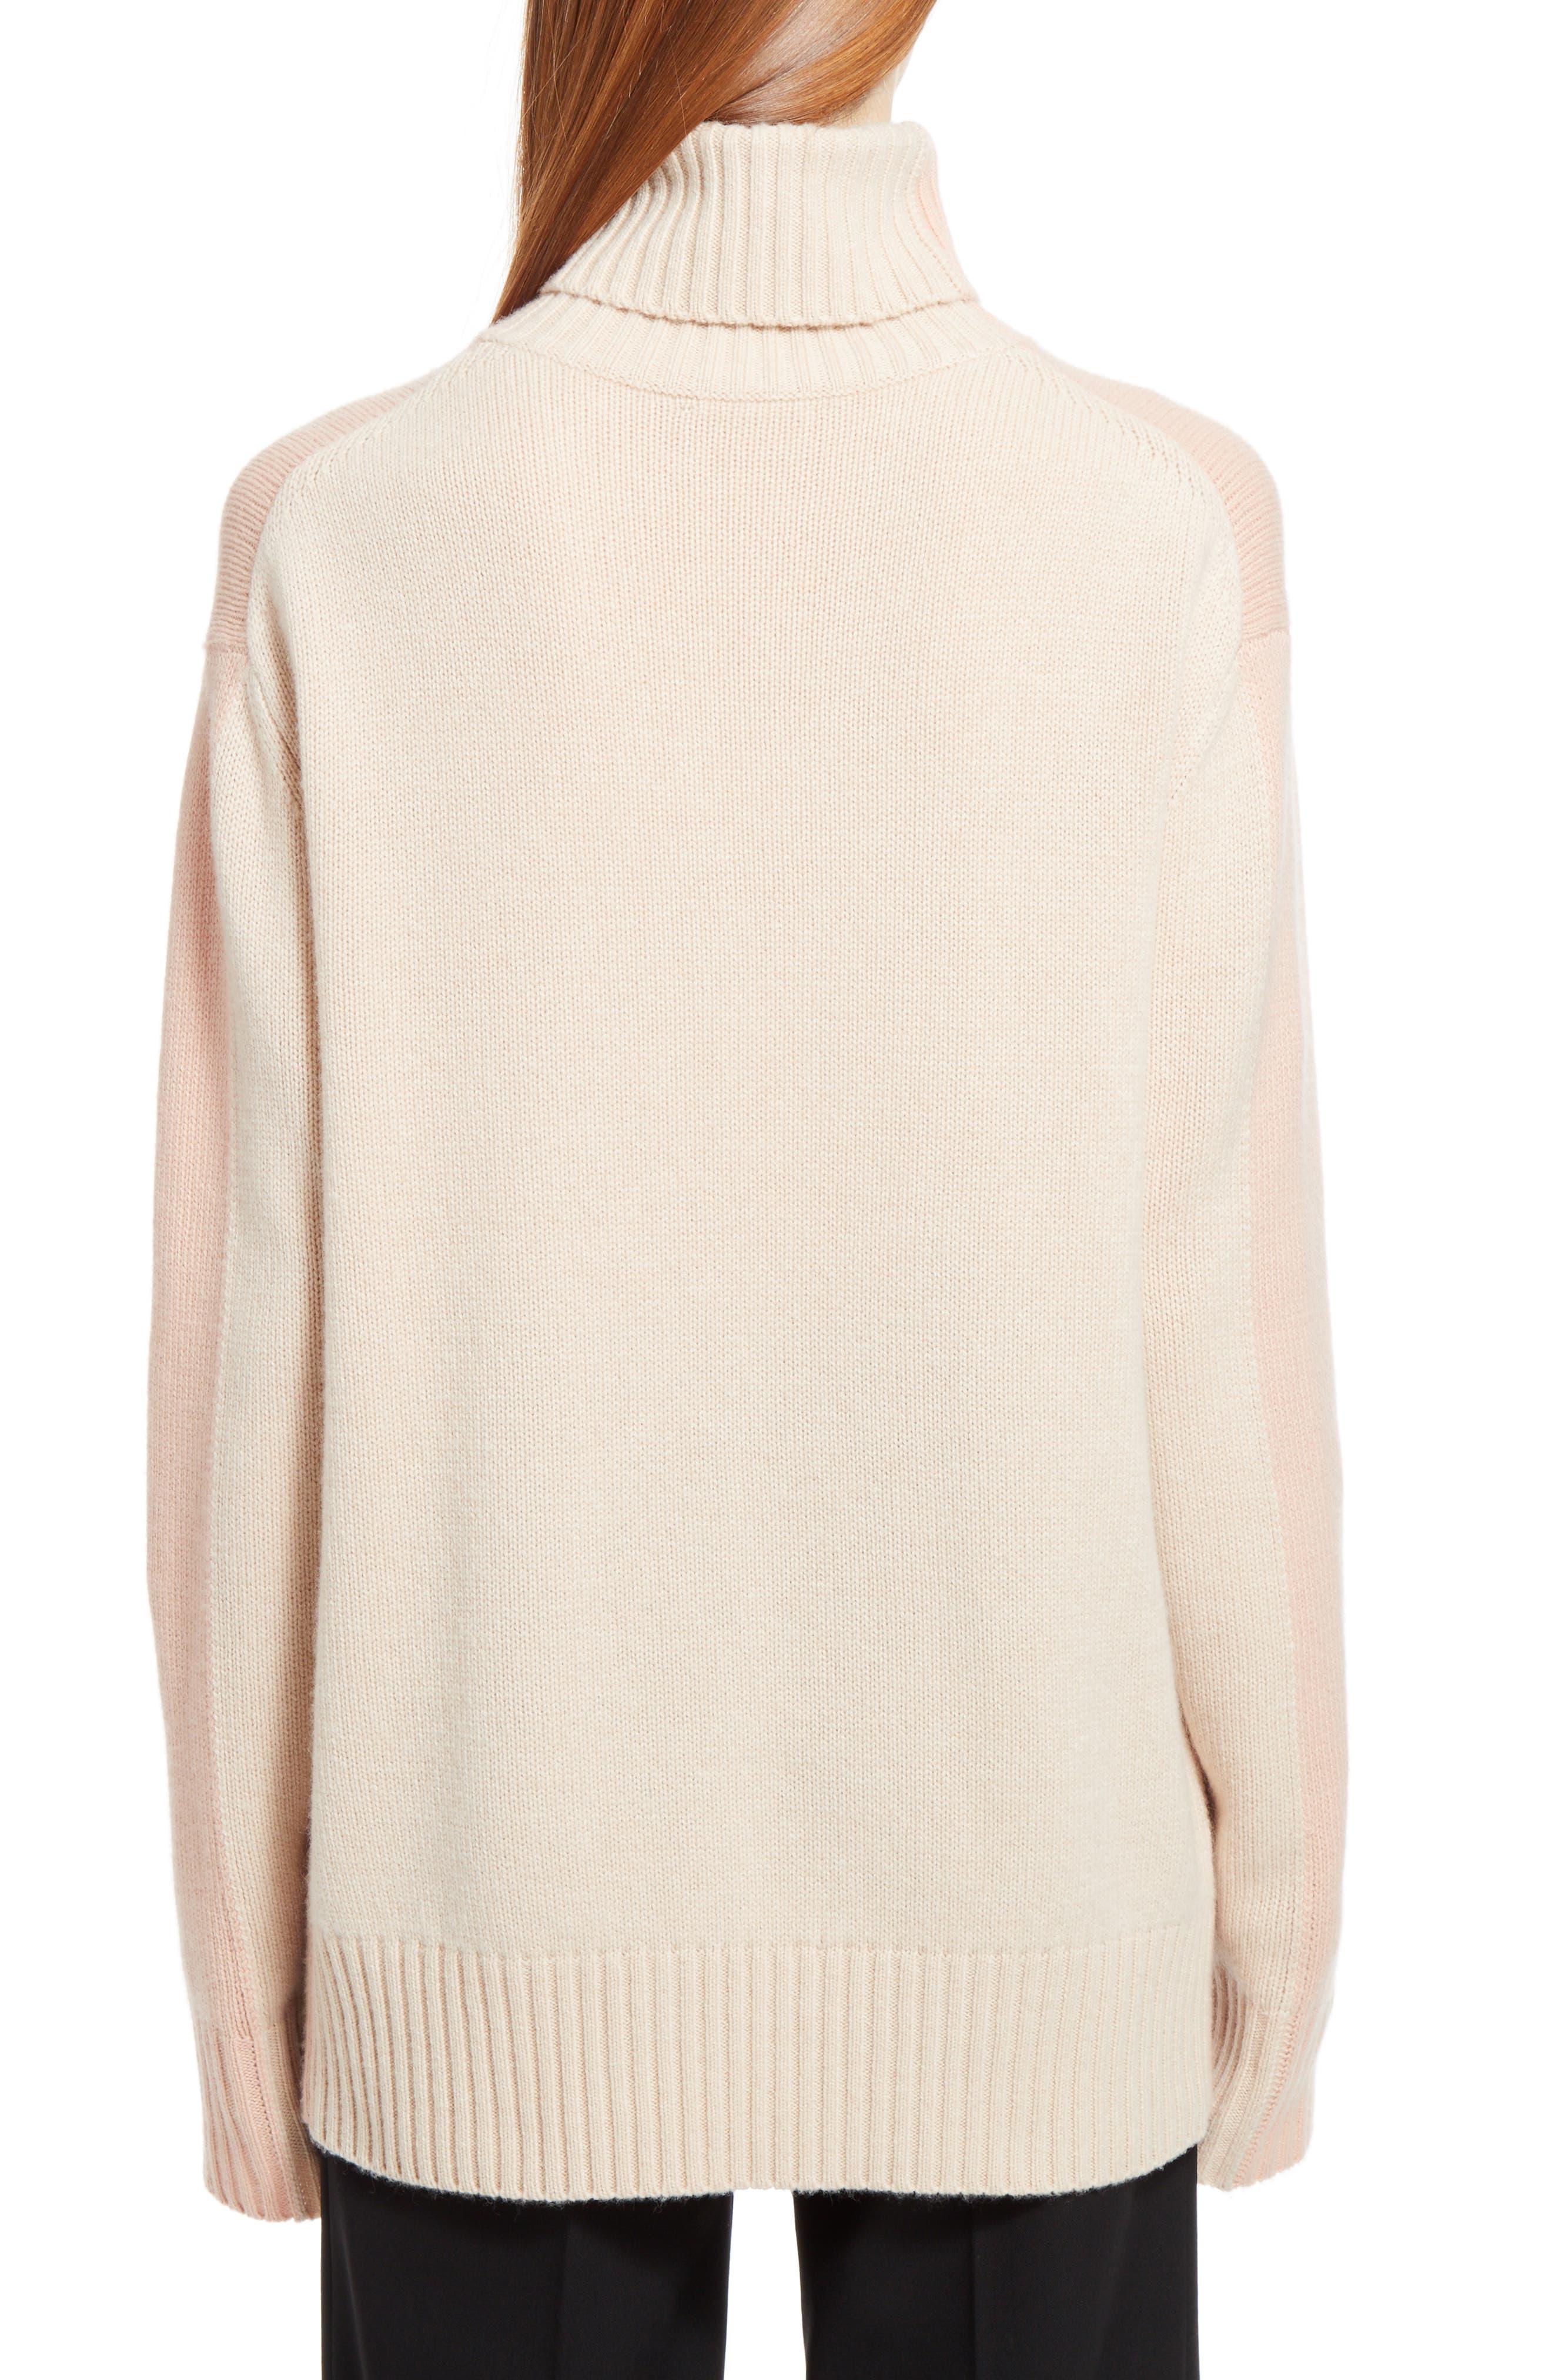 Colorblock Cashmere Turtleneck Sweater,                             Alternate thumbnail 2, color,                             650